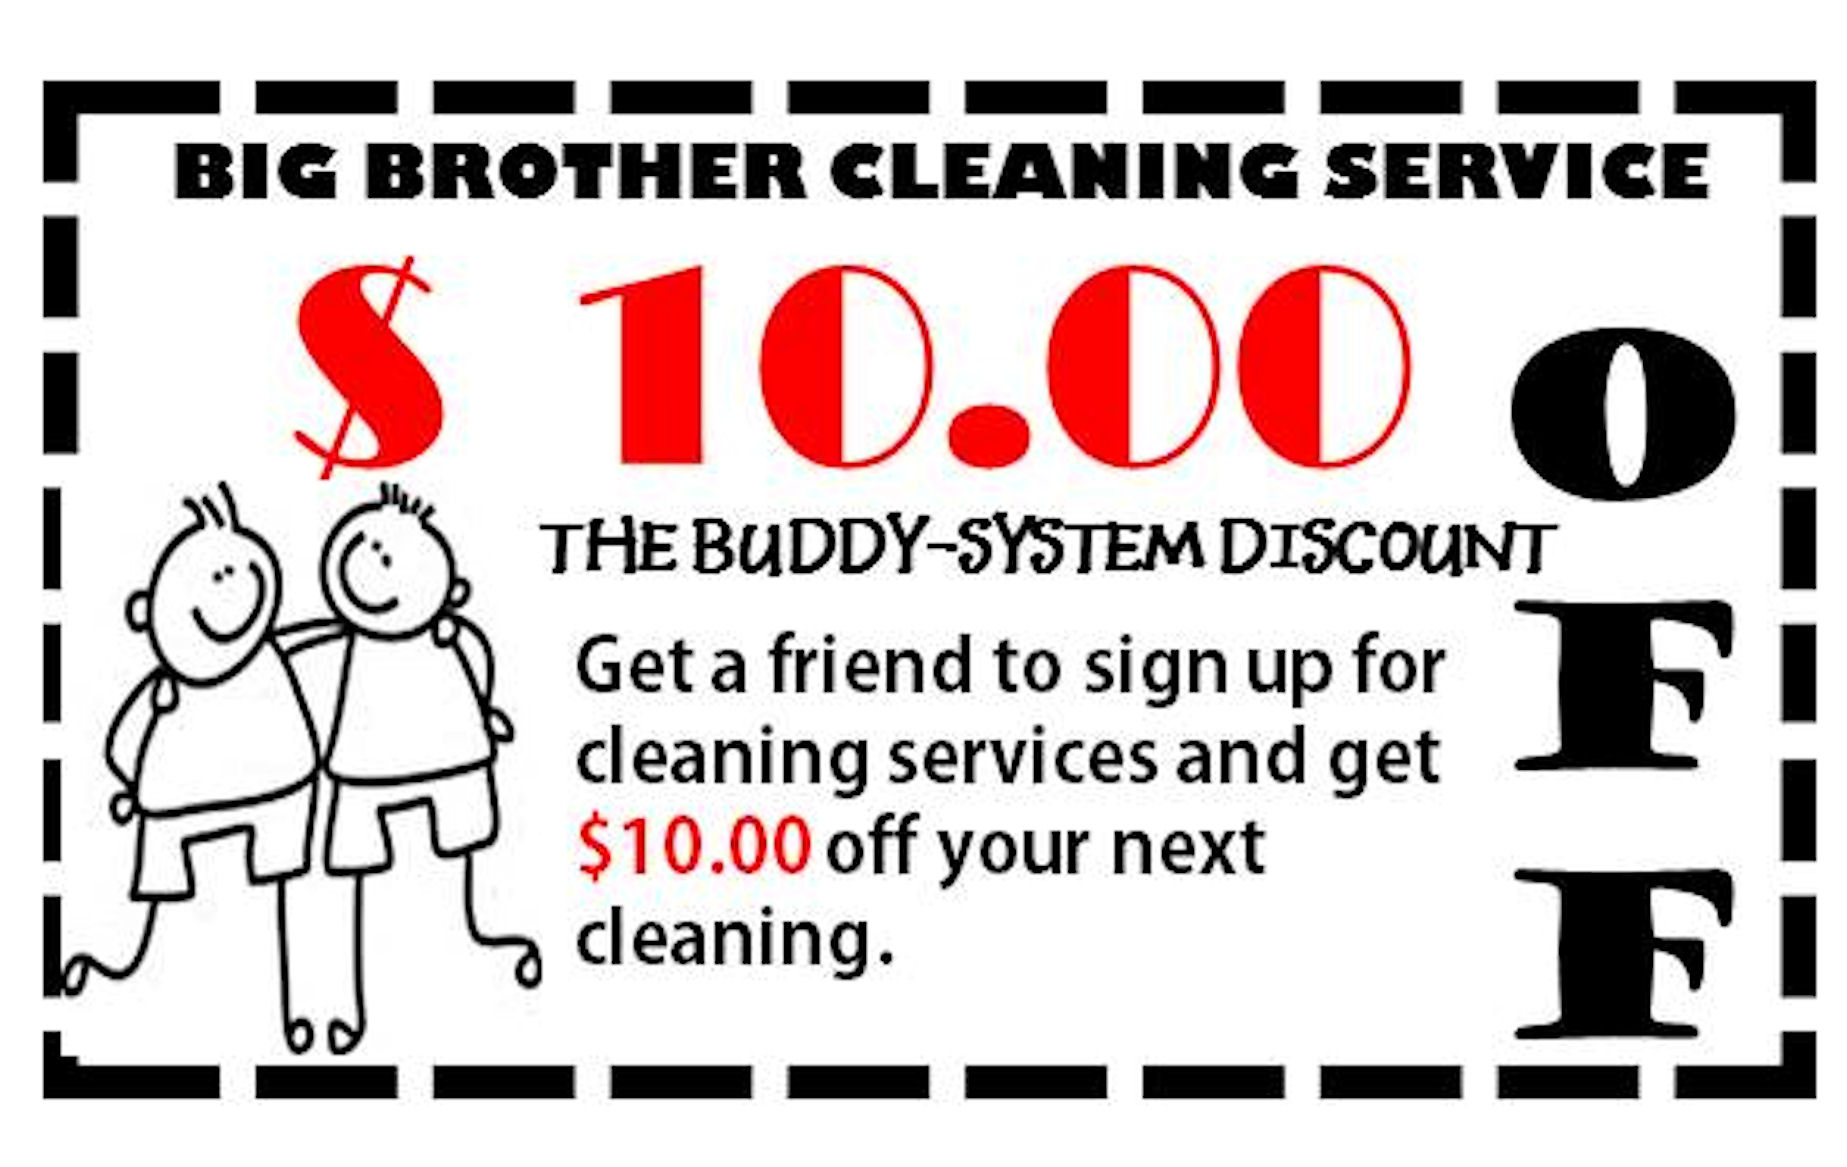 BUDDY-SYSTEM DISCOUNT